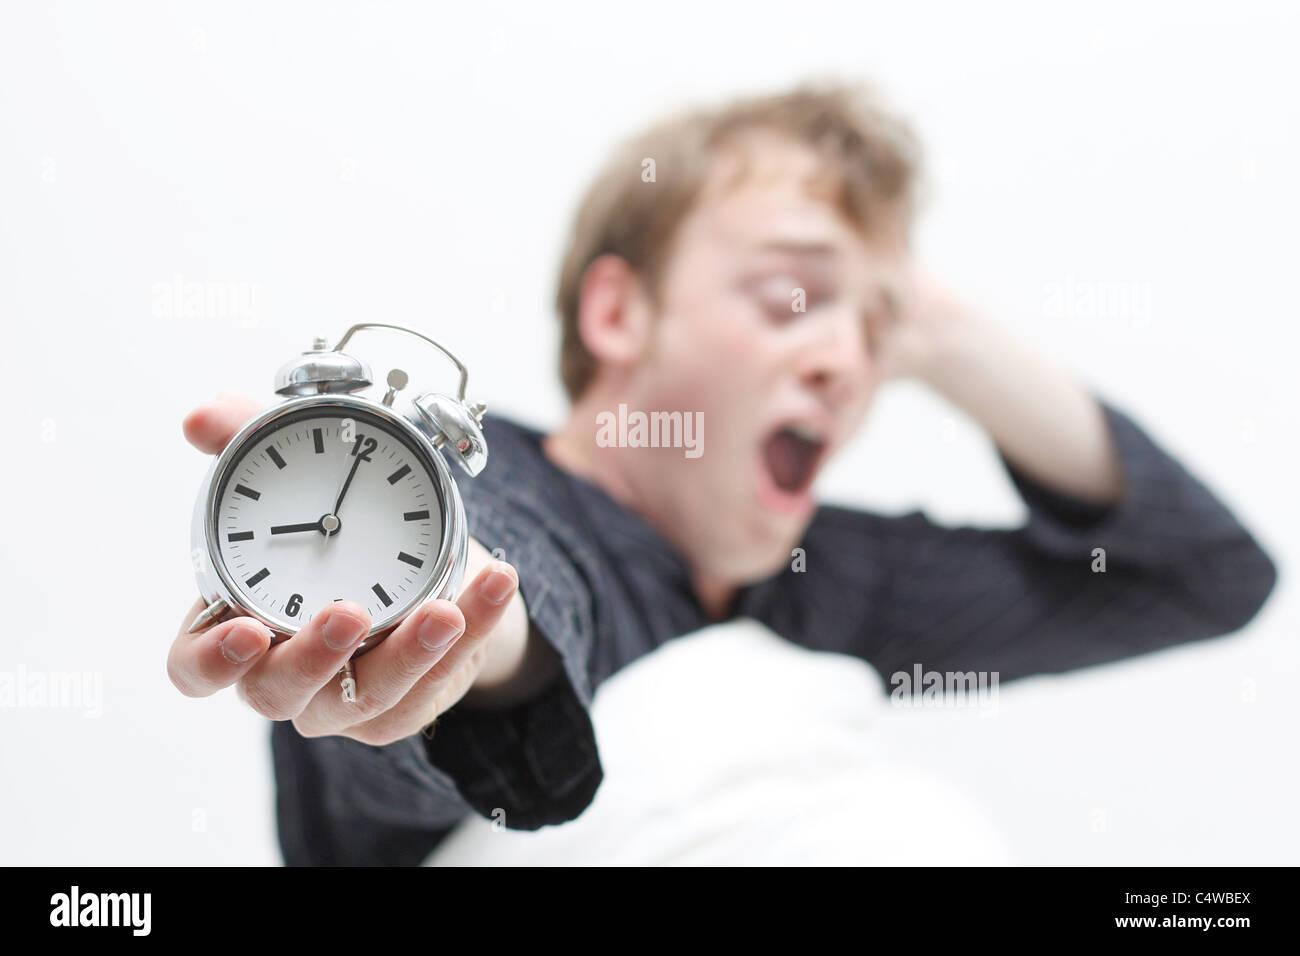 A man yawning - Stock Image